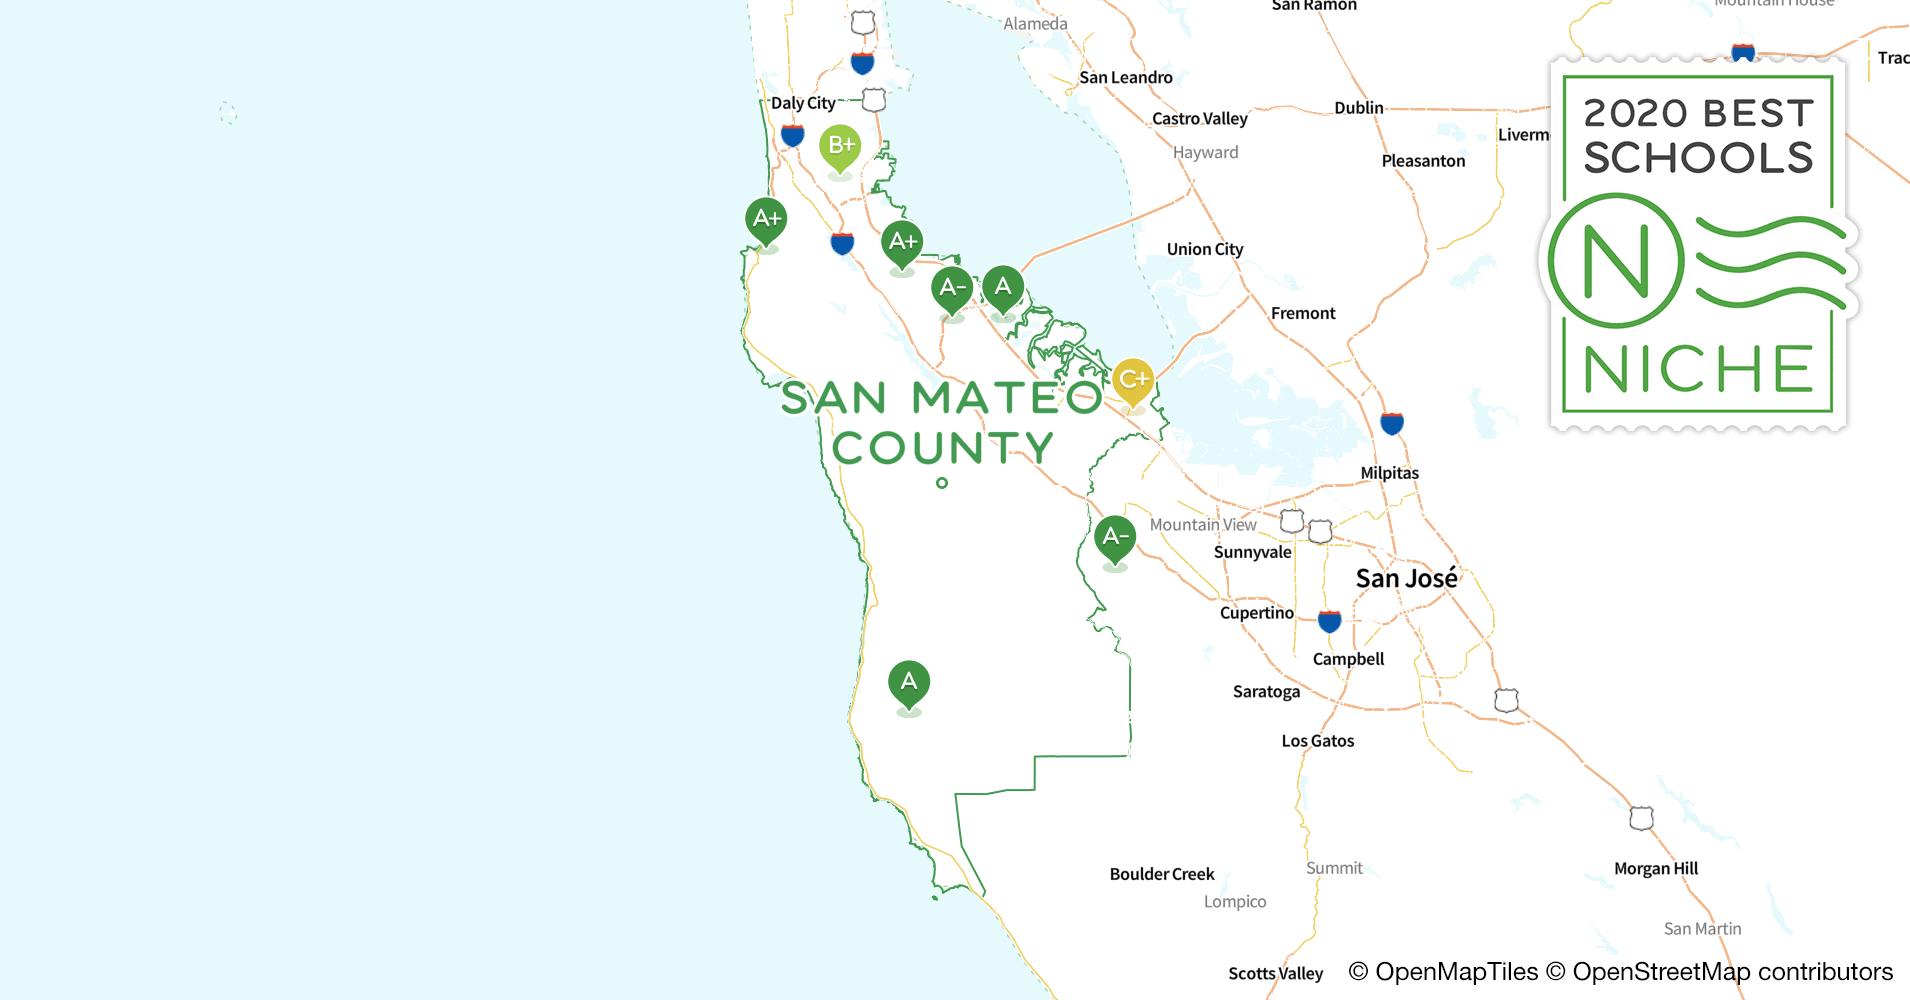 School Districts in San Mateo County, CA - Niche